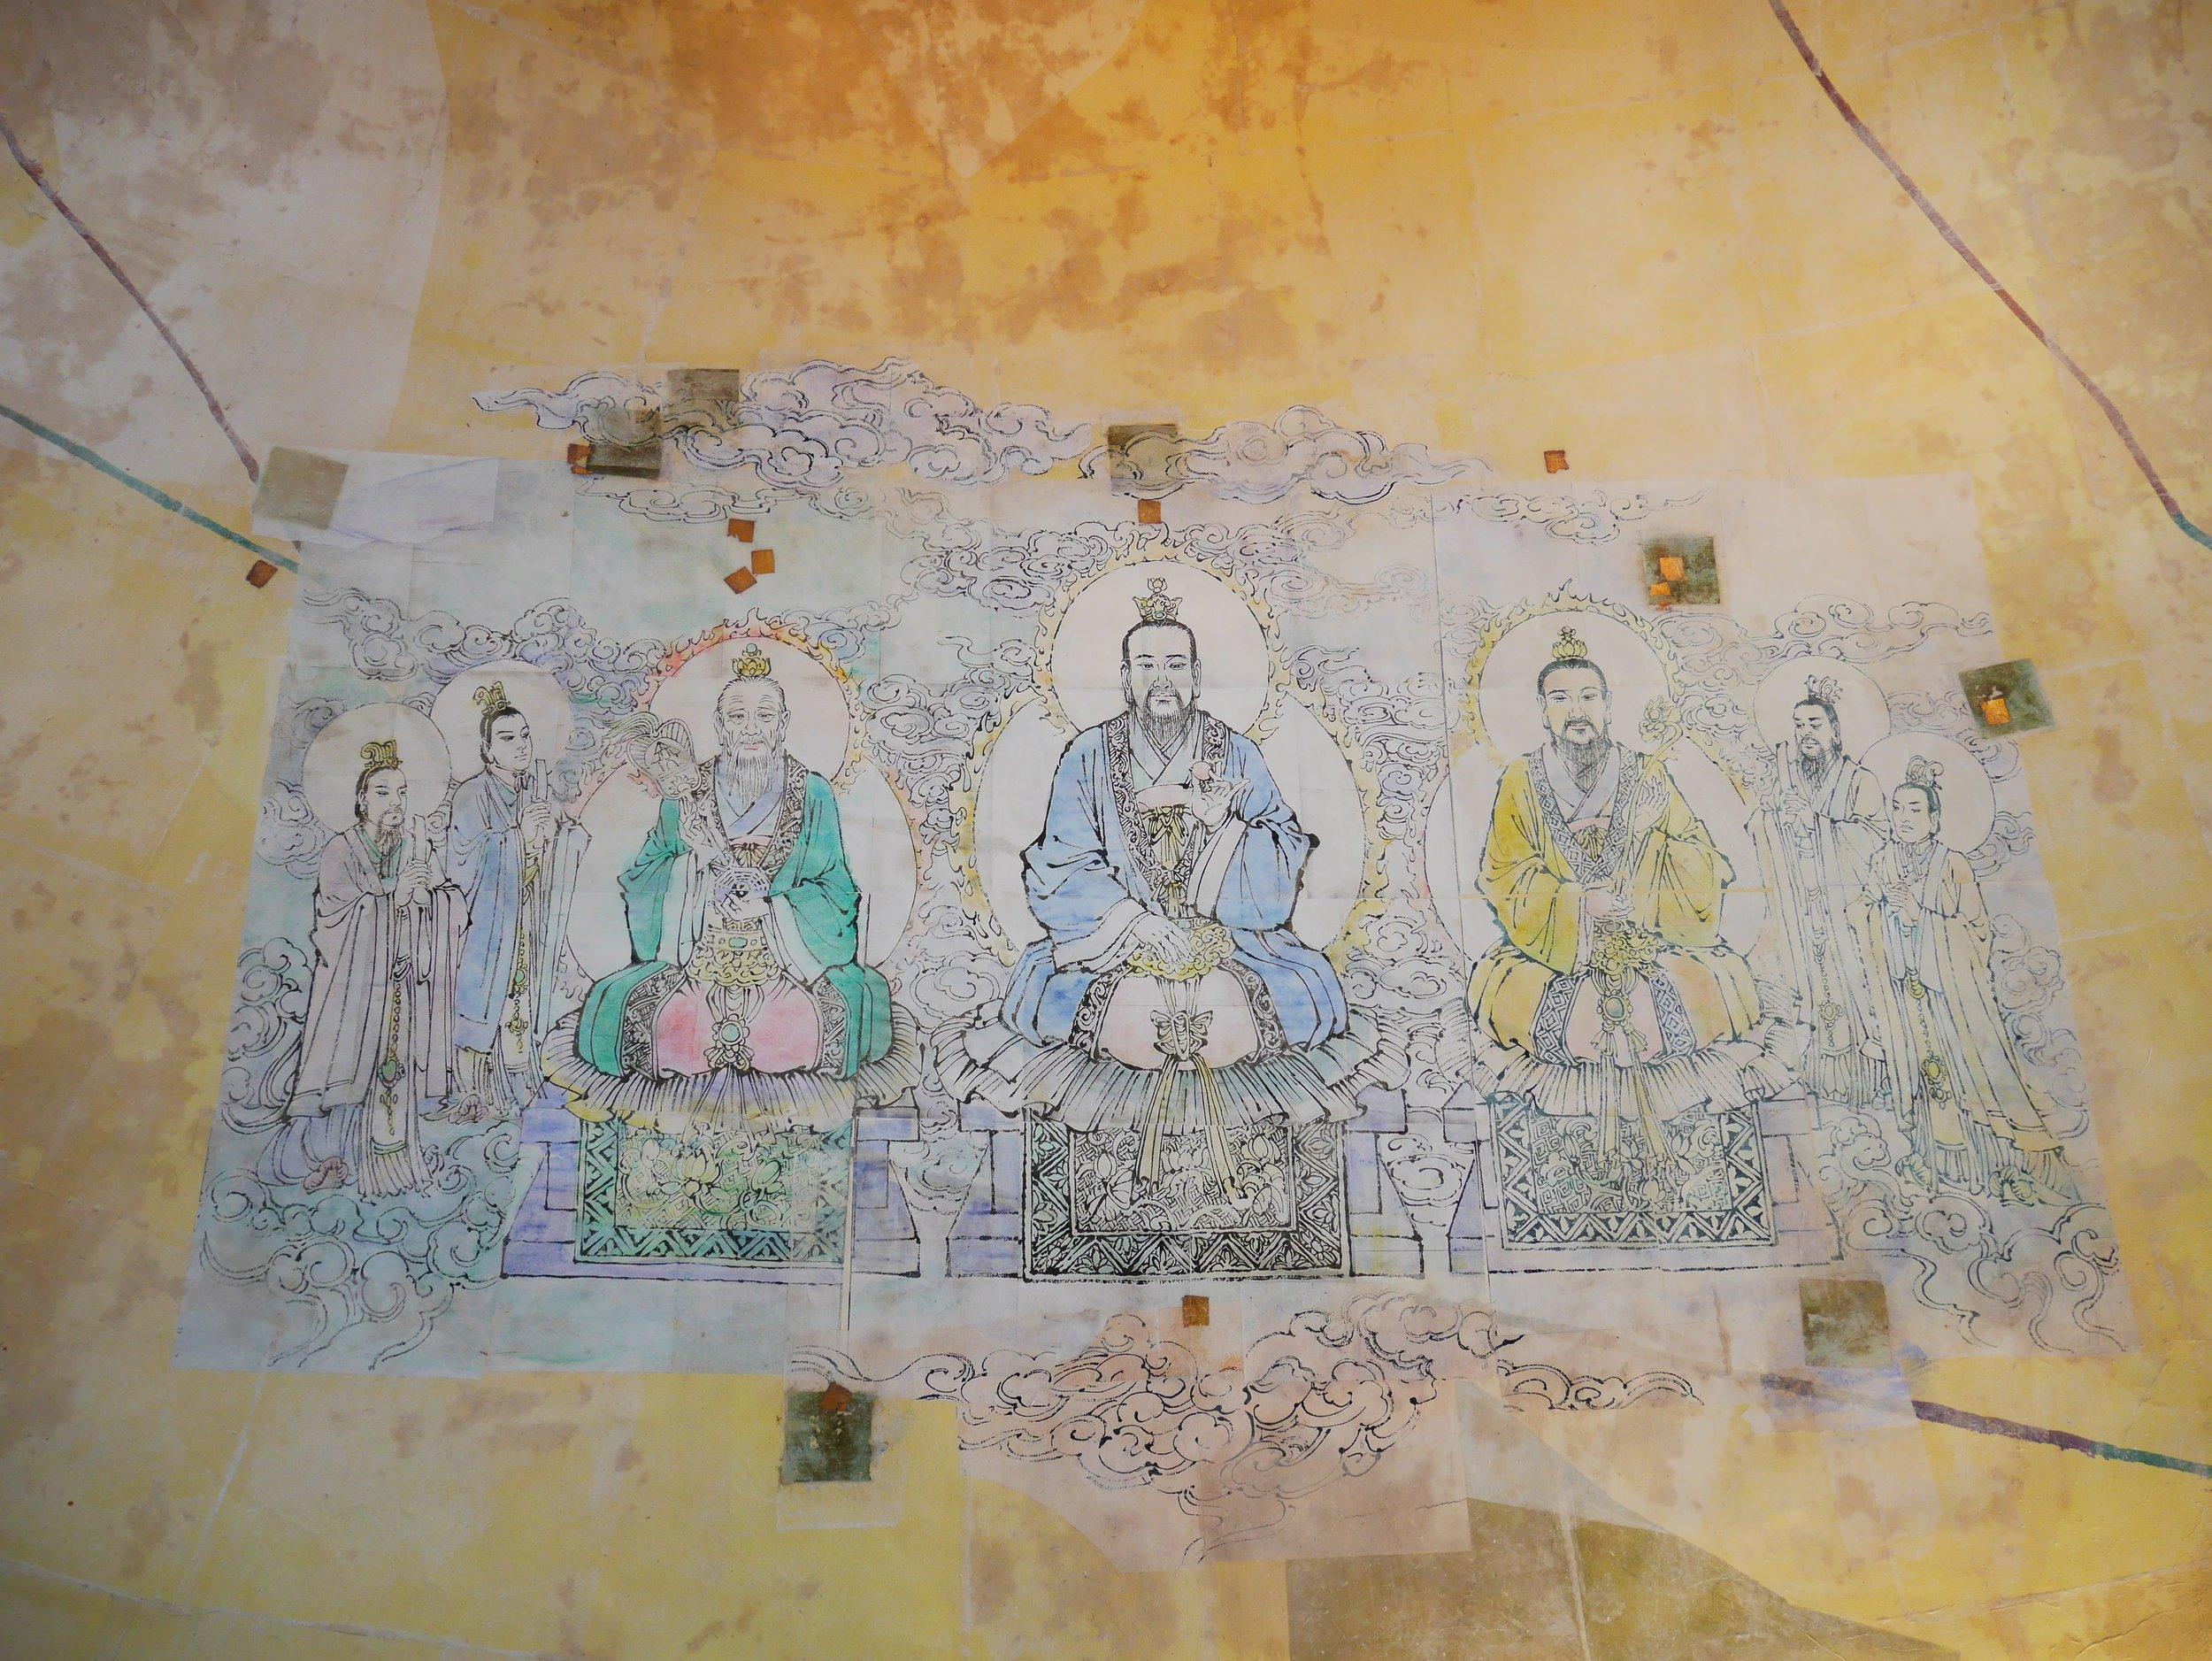 fresco murals depicting Taoist gods at the Kuan Iam Center in Macau